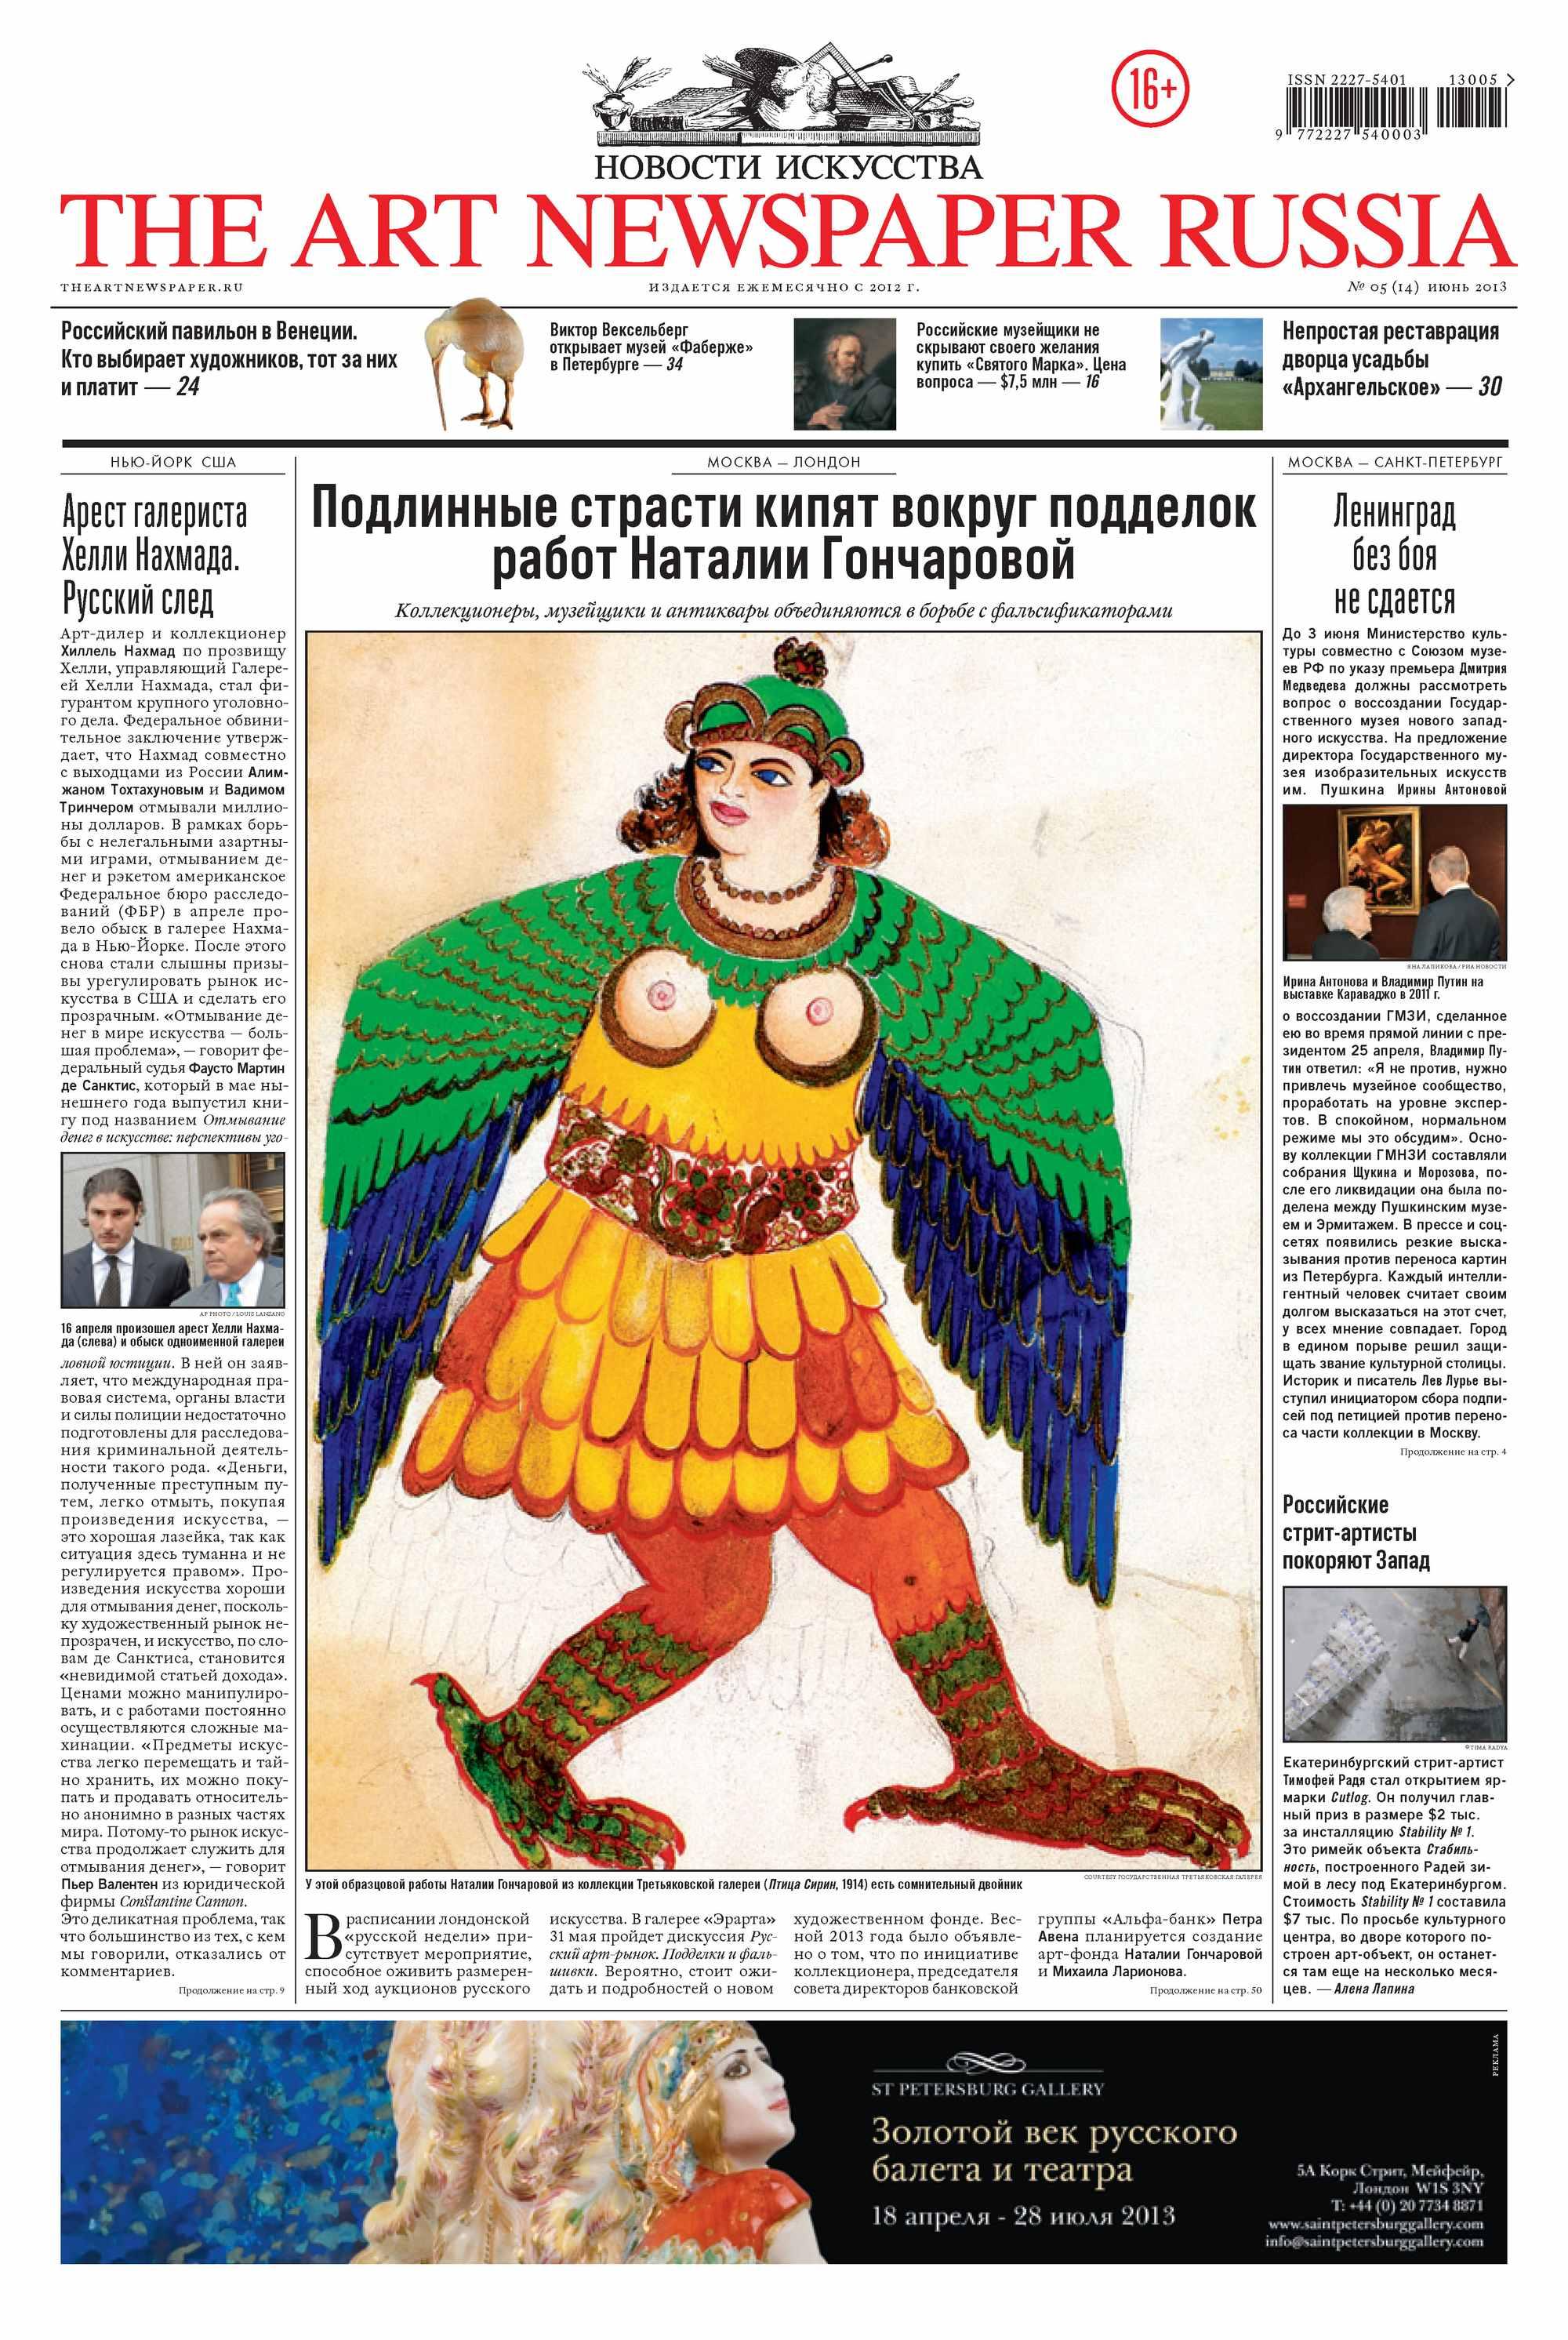 Отсутствует The Art Newspaper Russia №05 / июнь 2013 отсутствует the art newspaper russia 10 декабрь 2013 – январь 2014